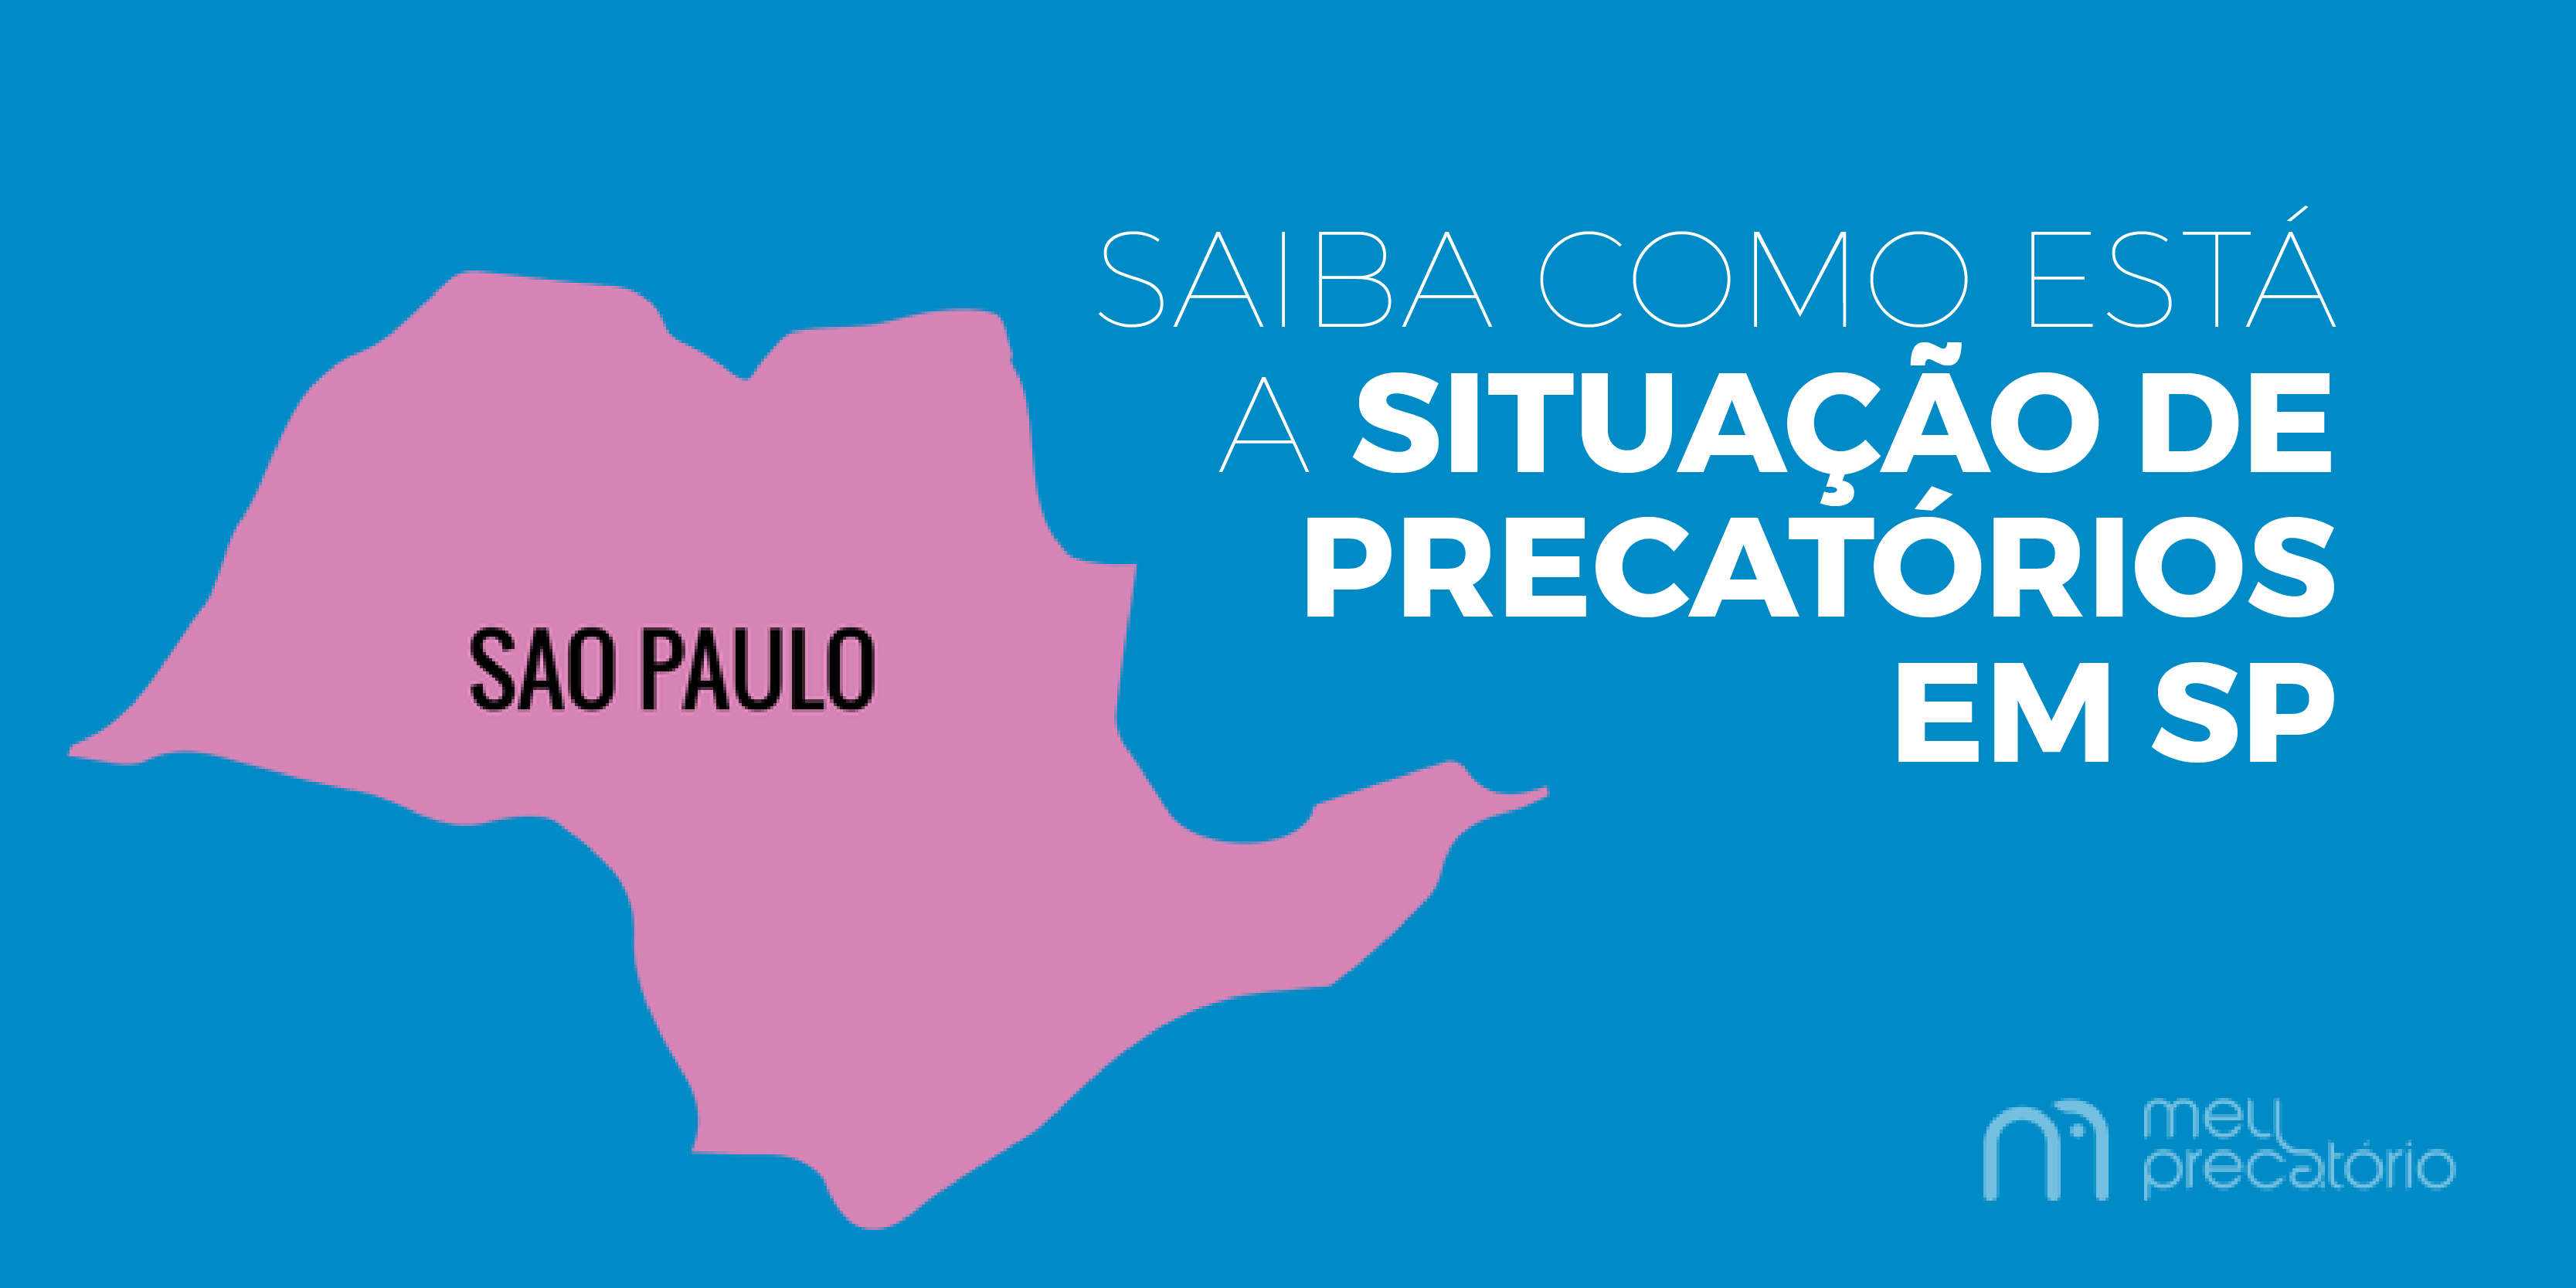 mapa ilustrativo de São Paulo